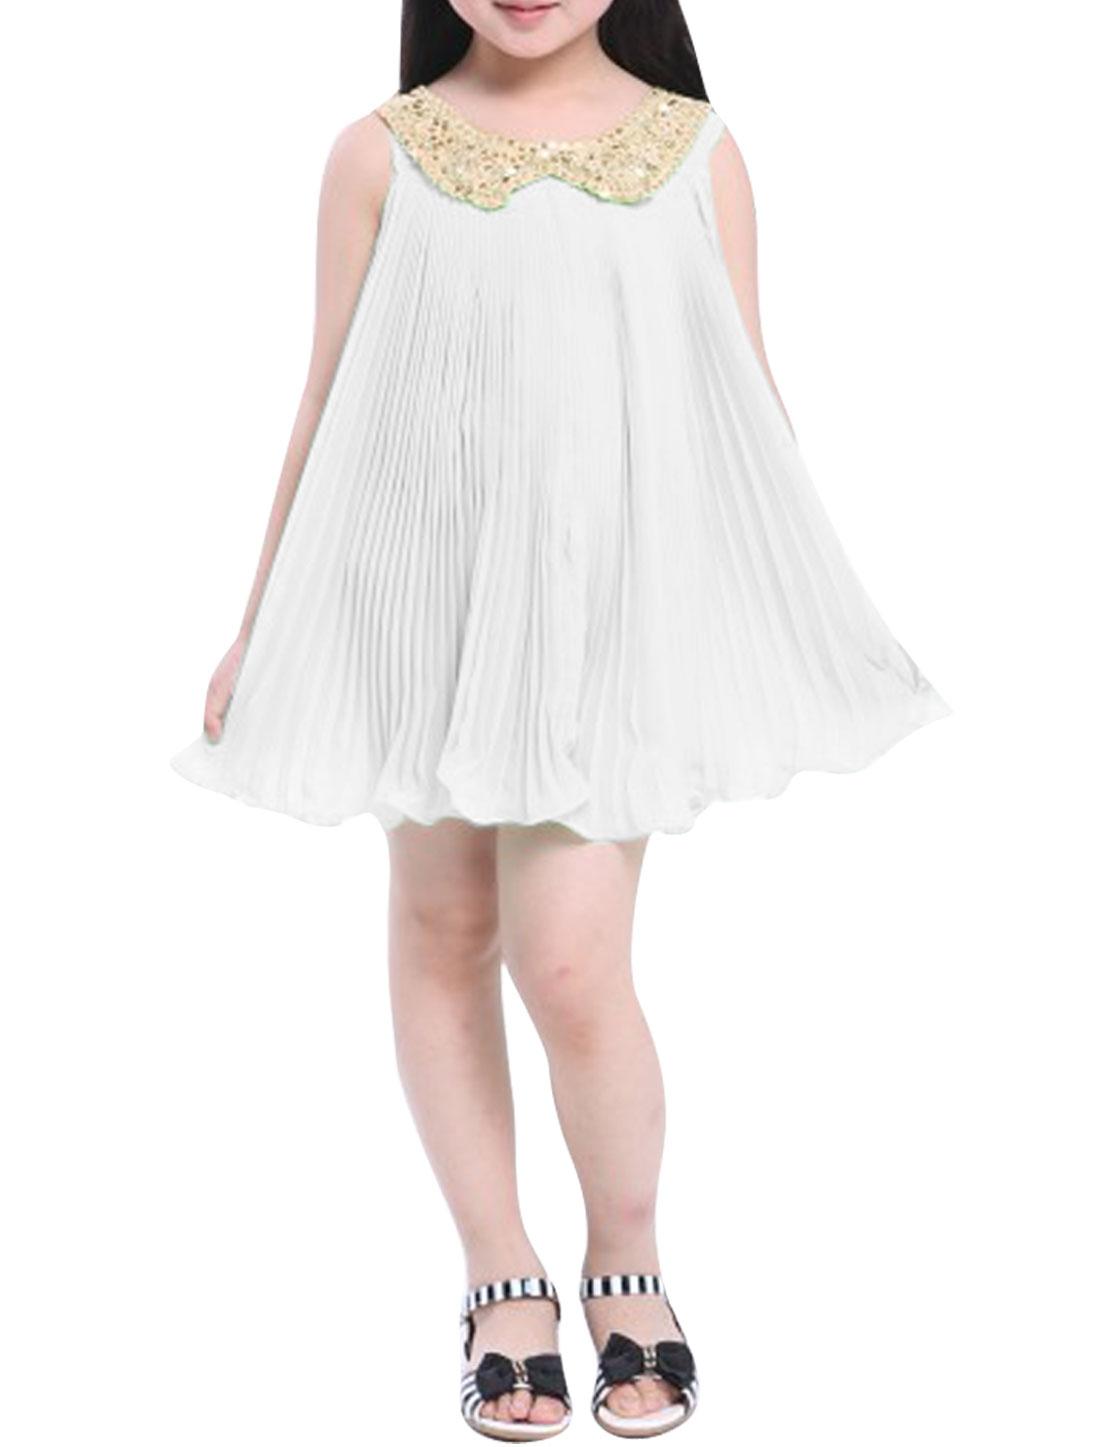 Lovely Girls Peter Pan Collar Sleeveless White Babydoll Dress 10